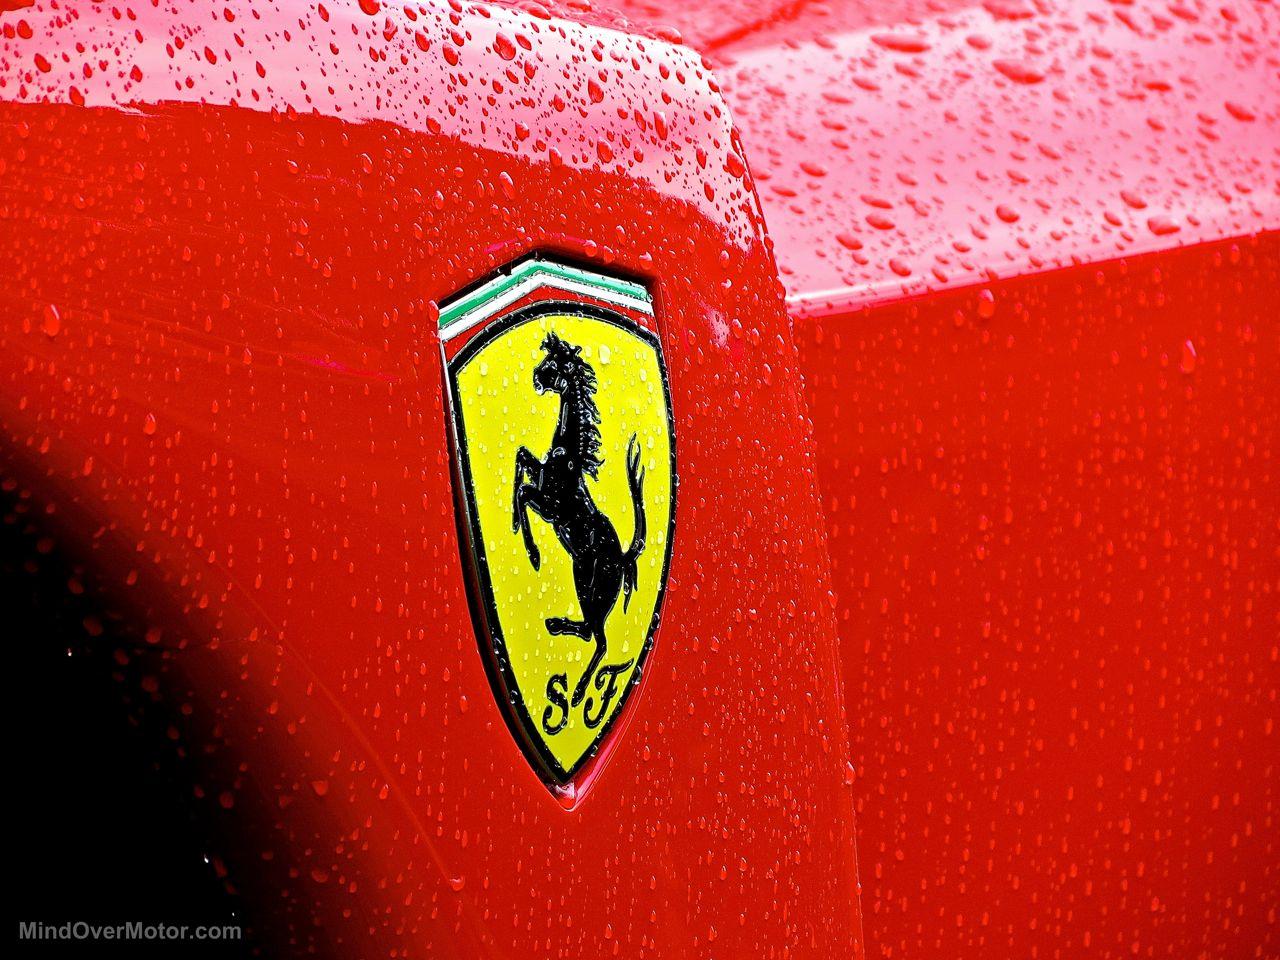 Greenwich 2 Wet Ferrari Shield